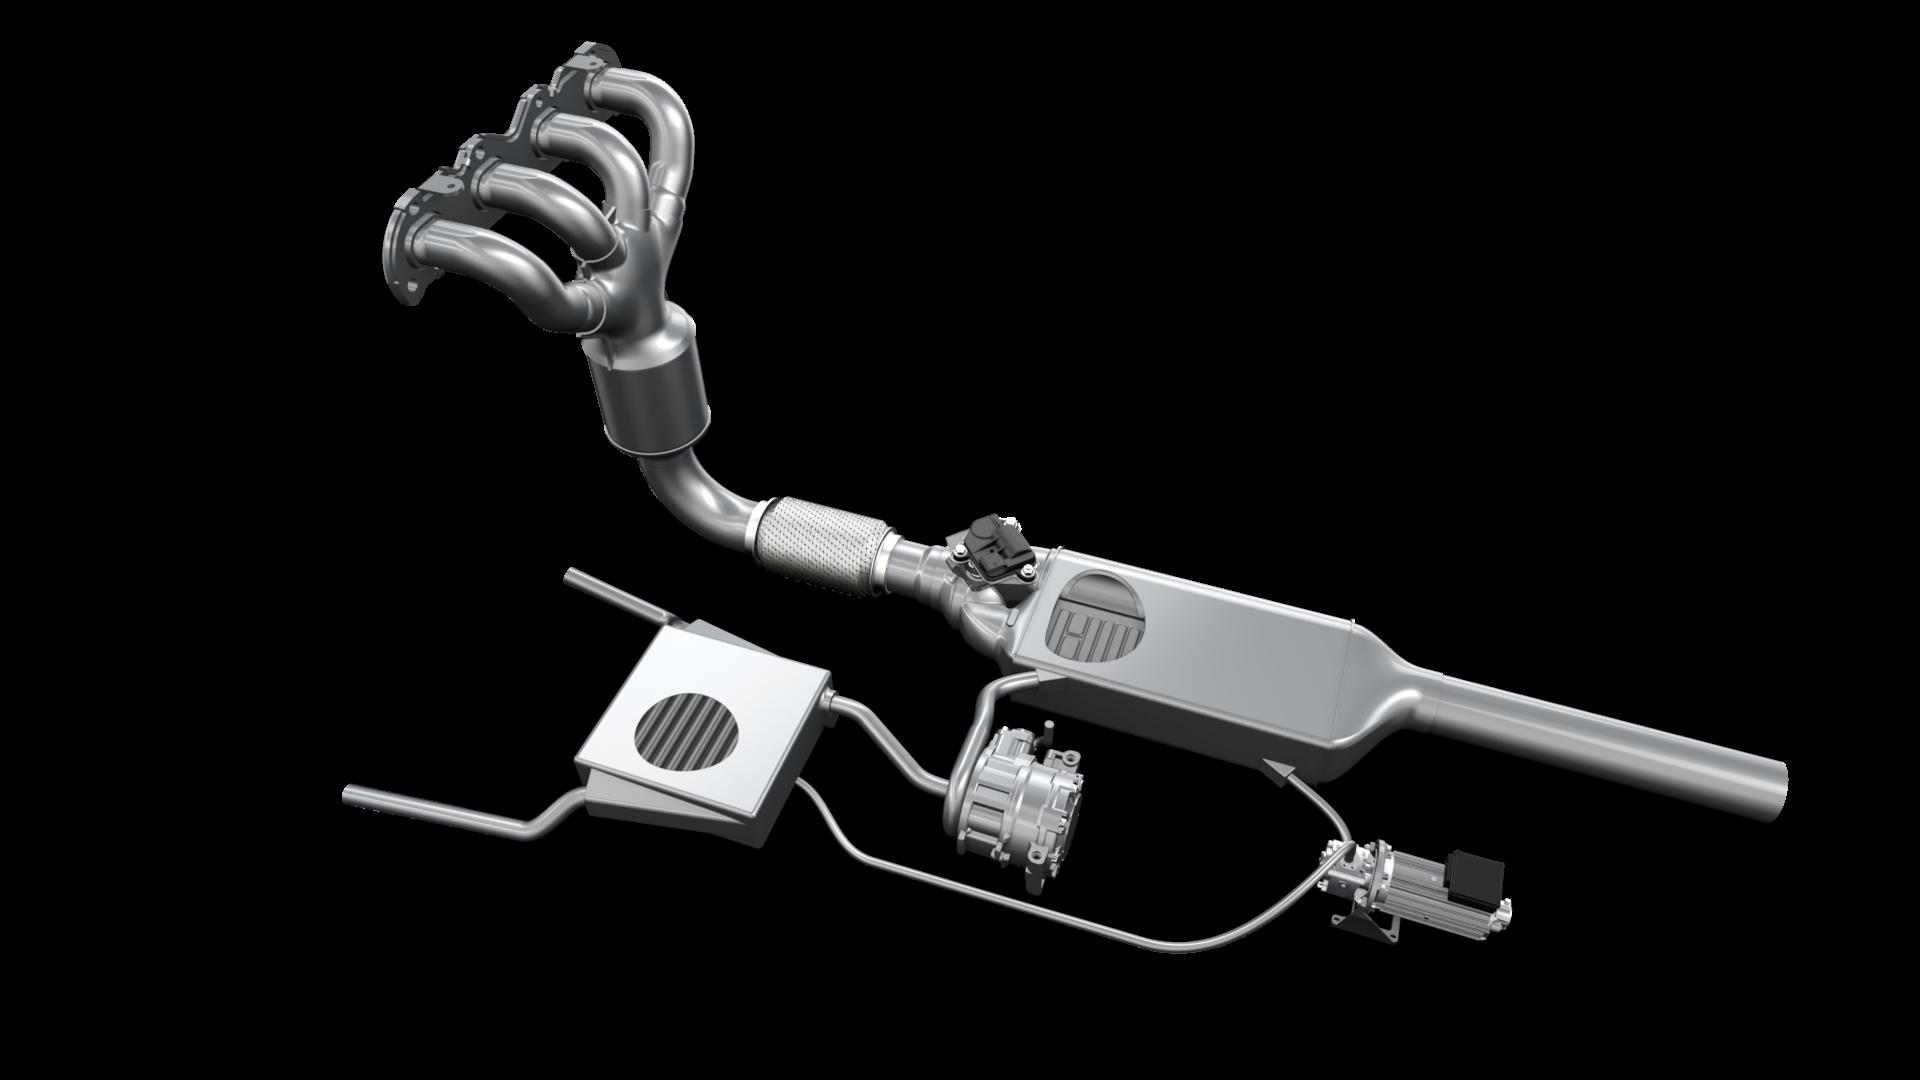 Das Faurecia EHPG-System